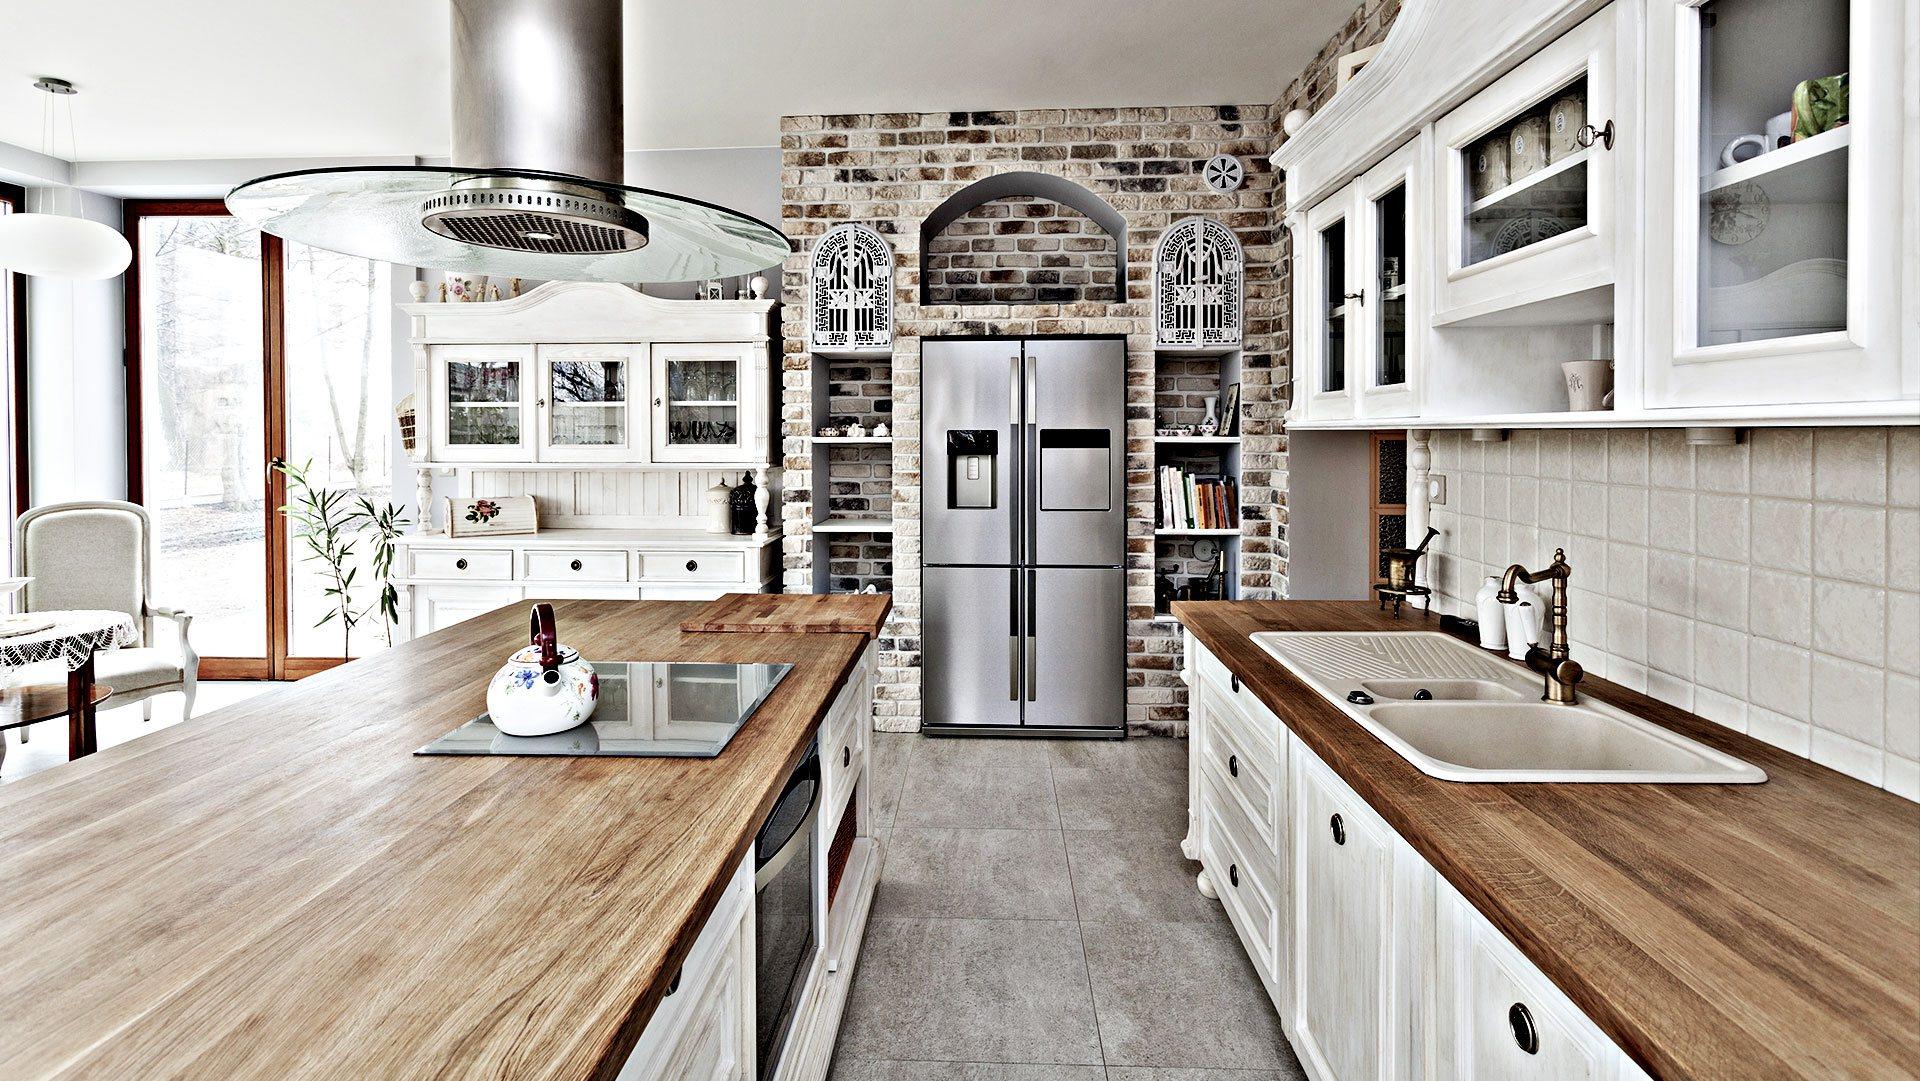 RK Construction Group LLC Remodeled Kitchen 1